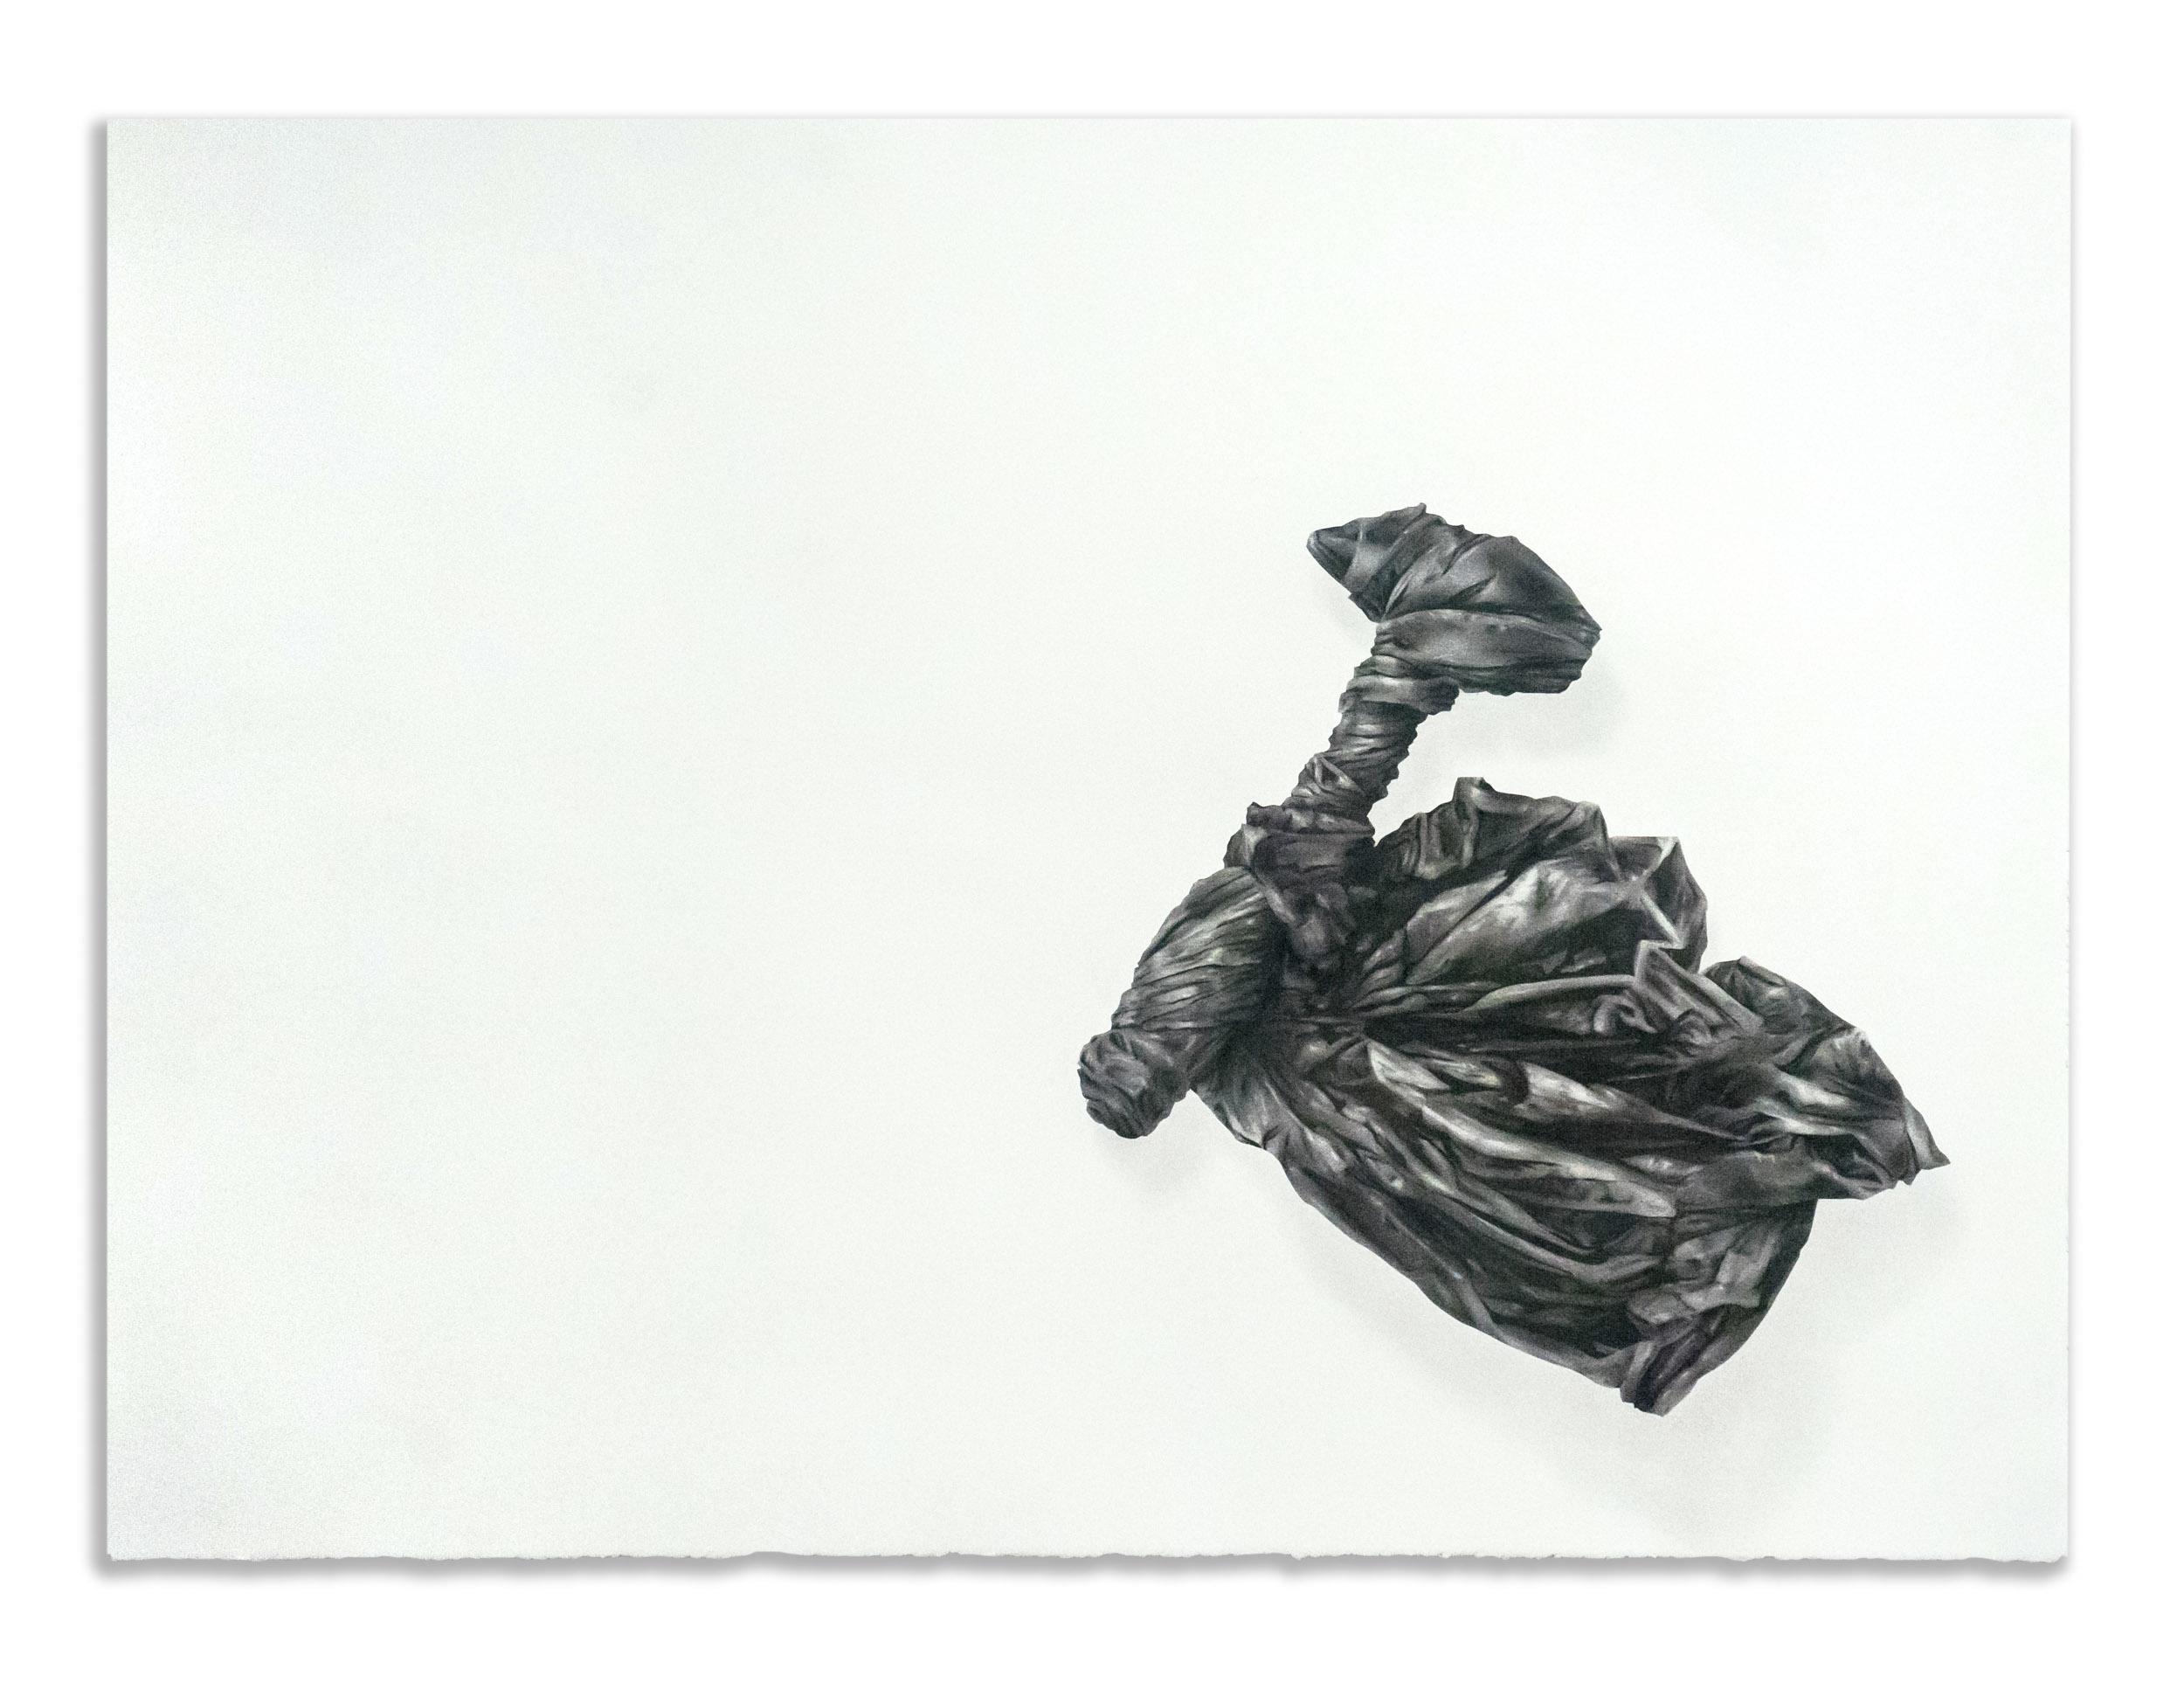 wassaic-project-artist-ryder-richards-trash-painting-hammer-2019-05-02-11-25-57.jpg